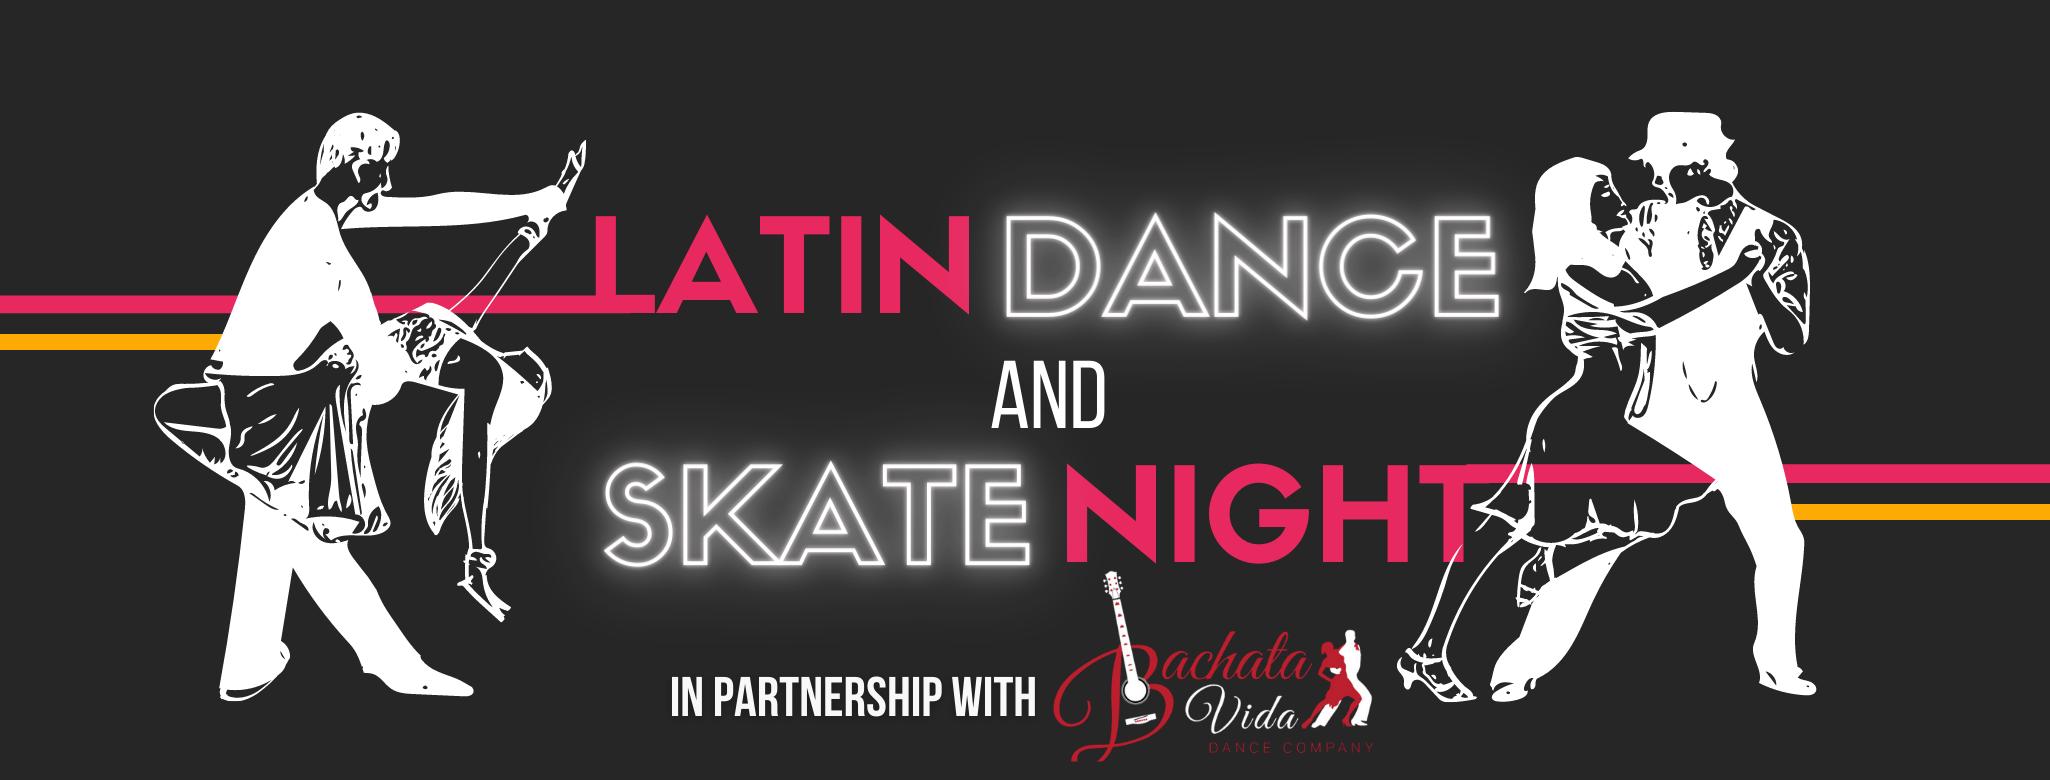 Latin Night Cover Photo